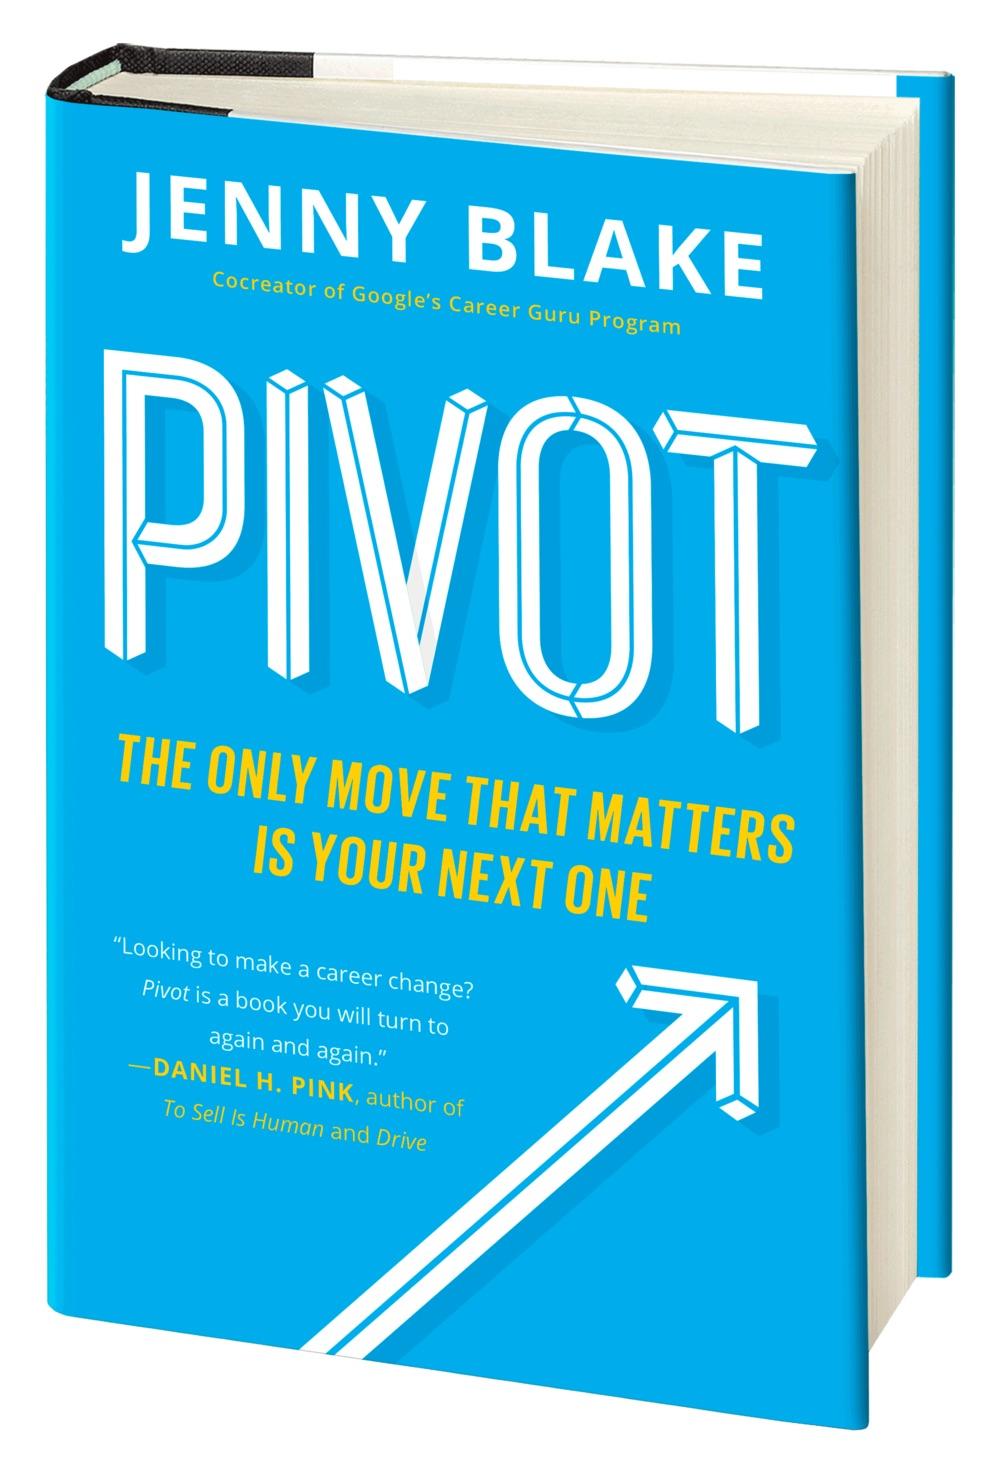 Pivot_BookCover_JennyBlake.jpg